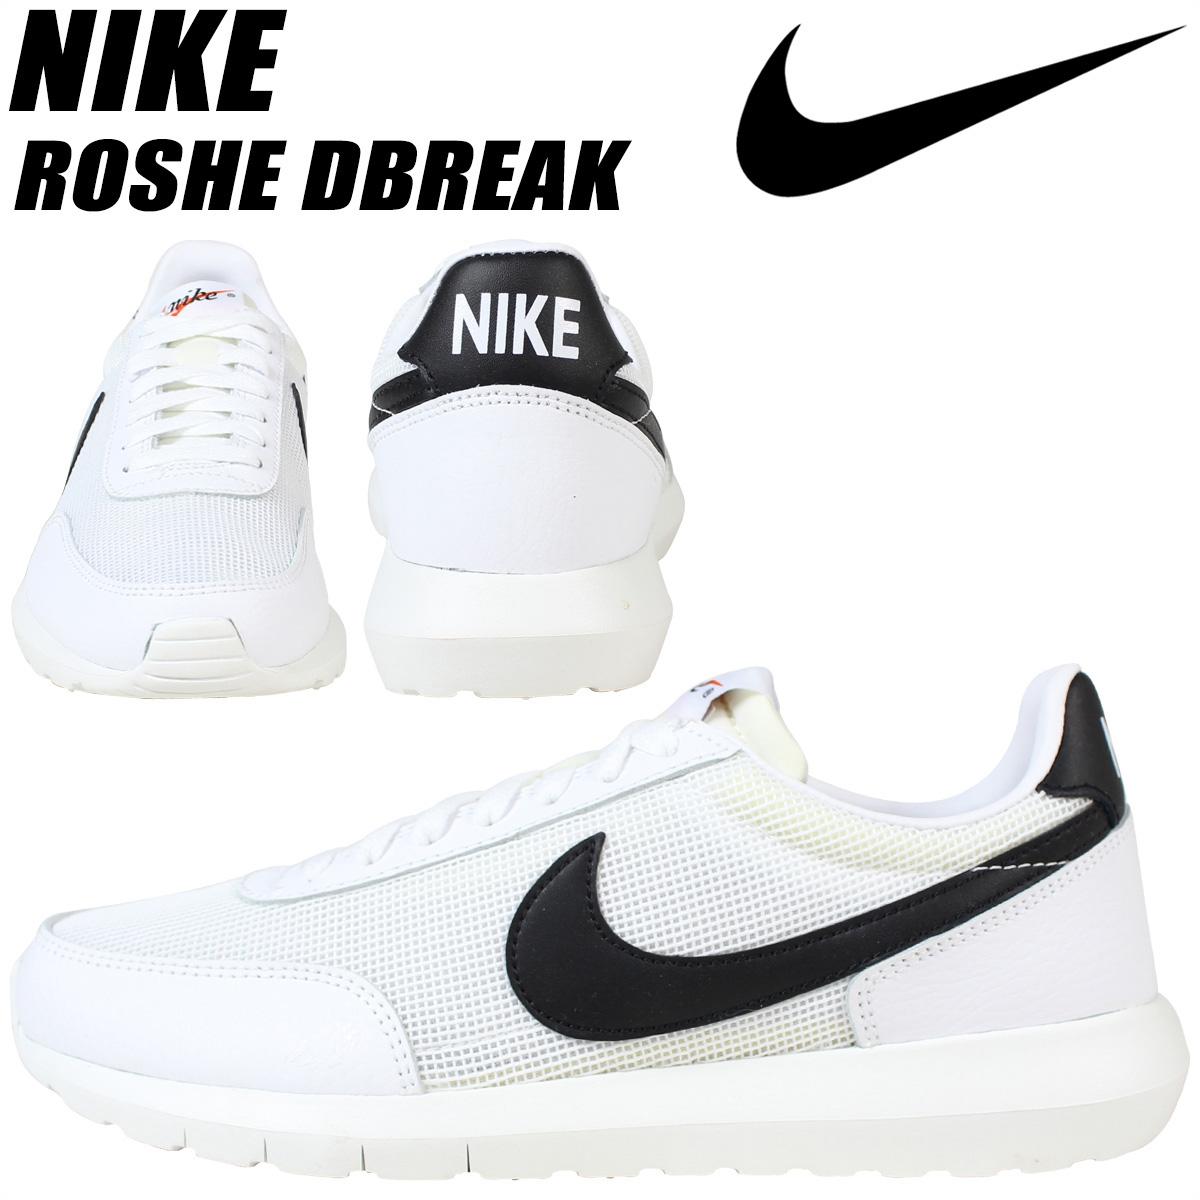 82f2414a4e27 ... top quality nike nike ros daybreak sneakers roshe daybreak nm 826666  100 mens shoes white 55795